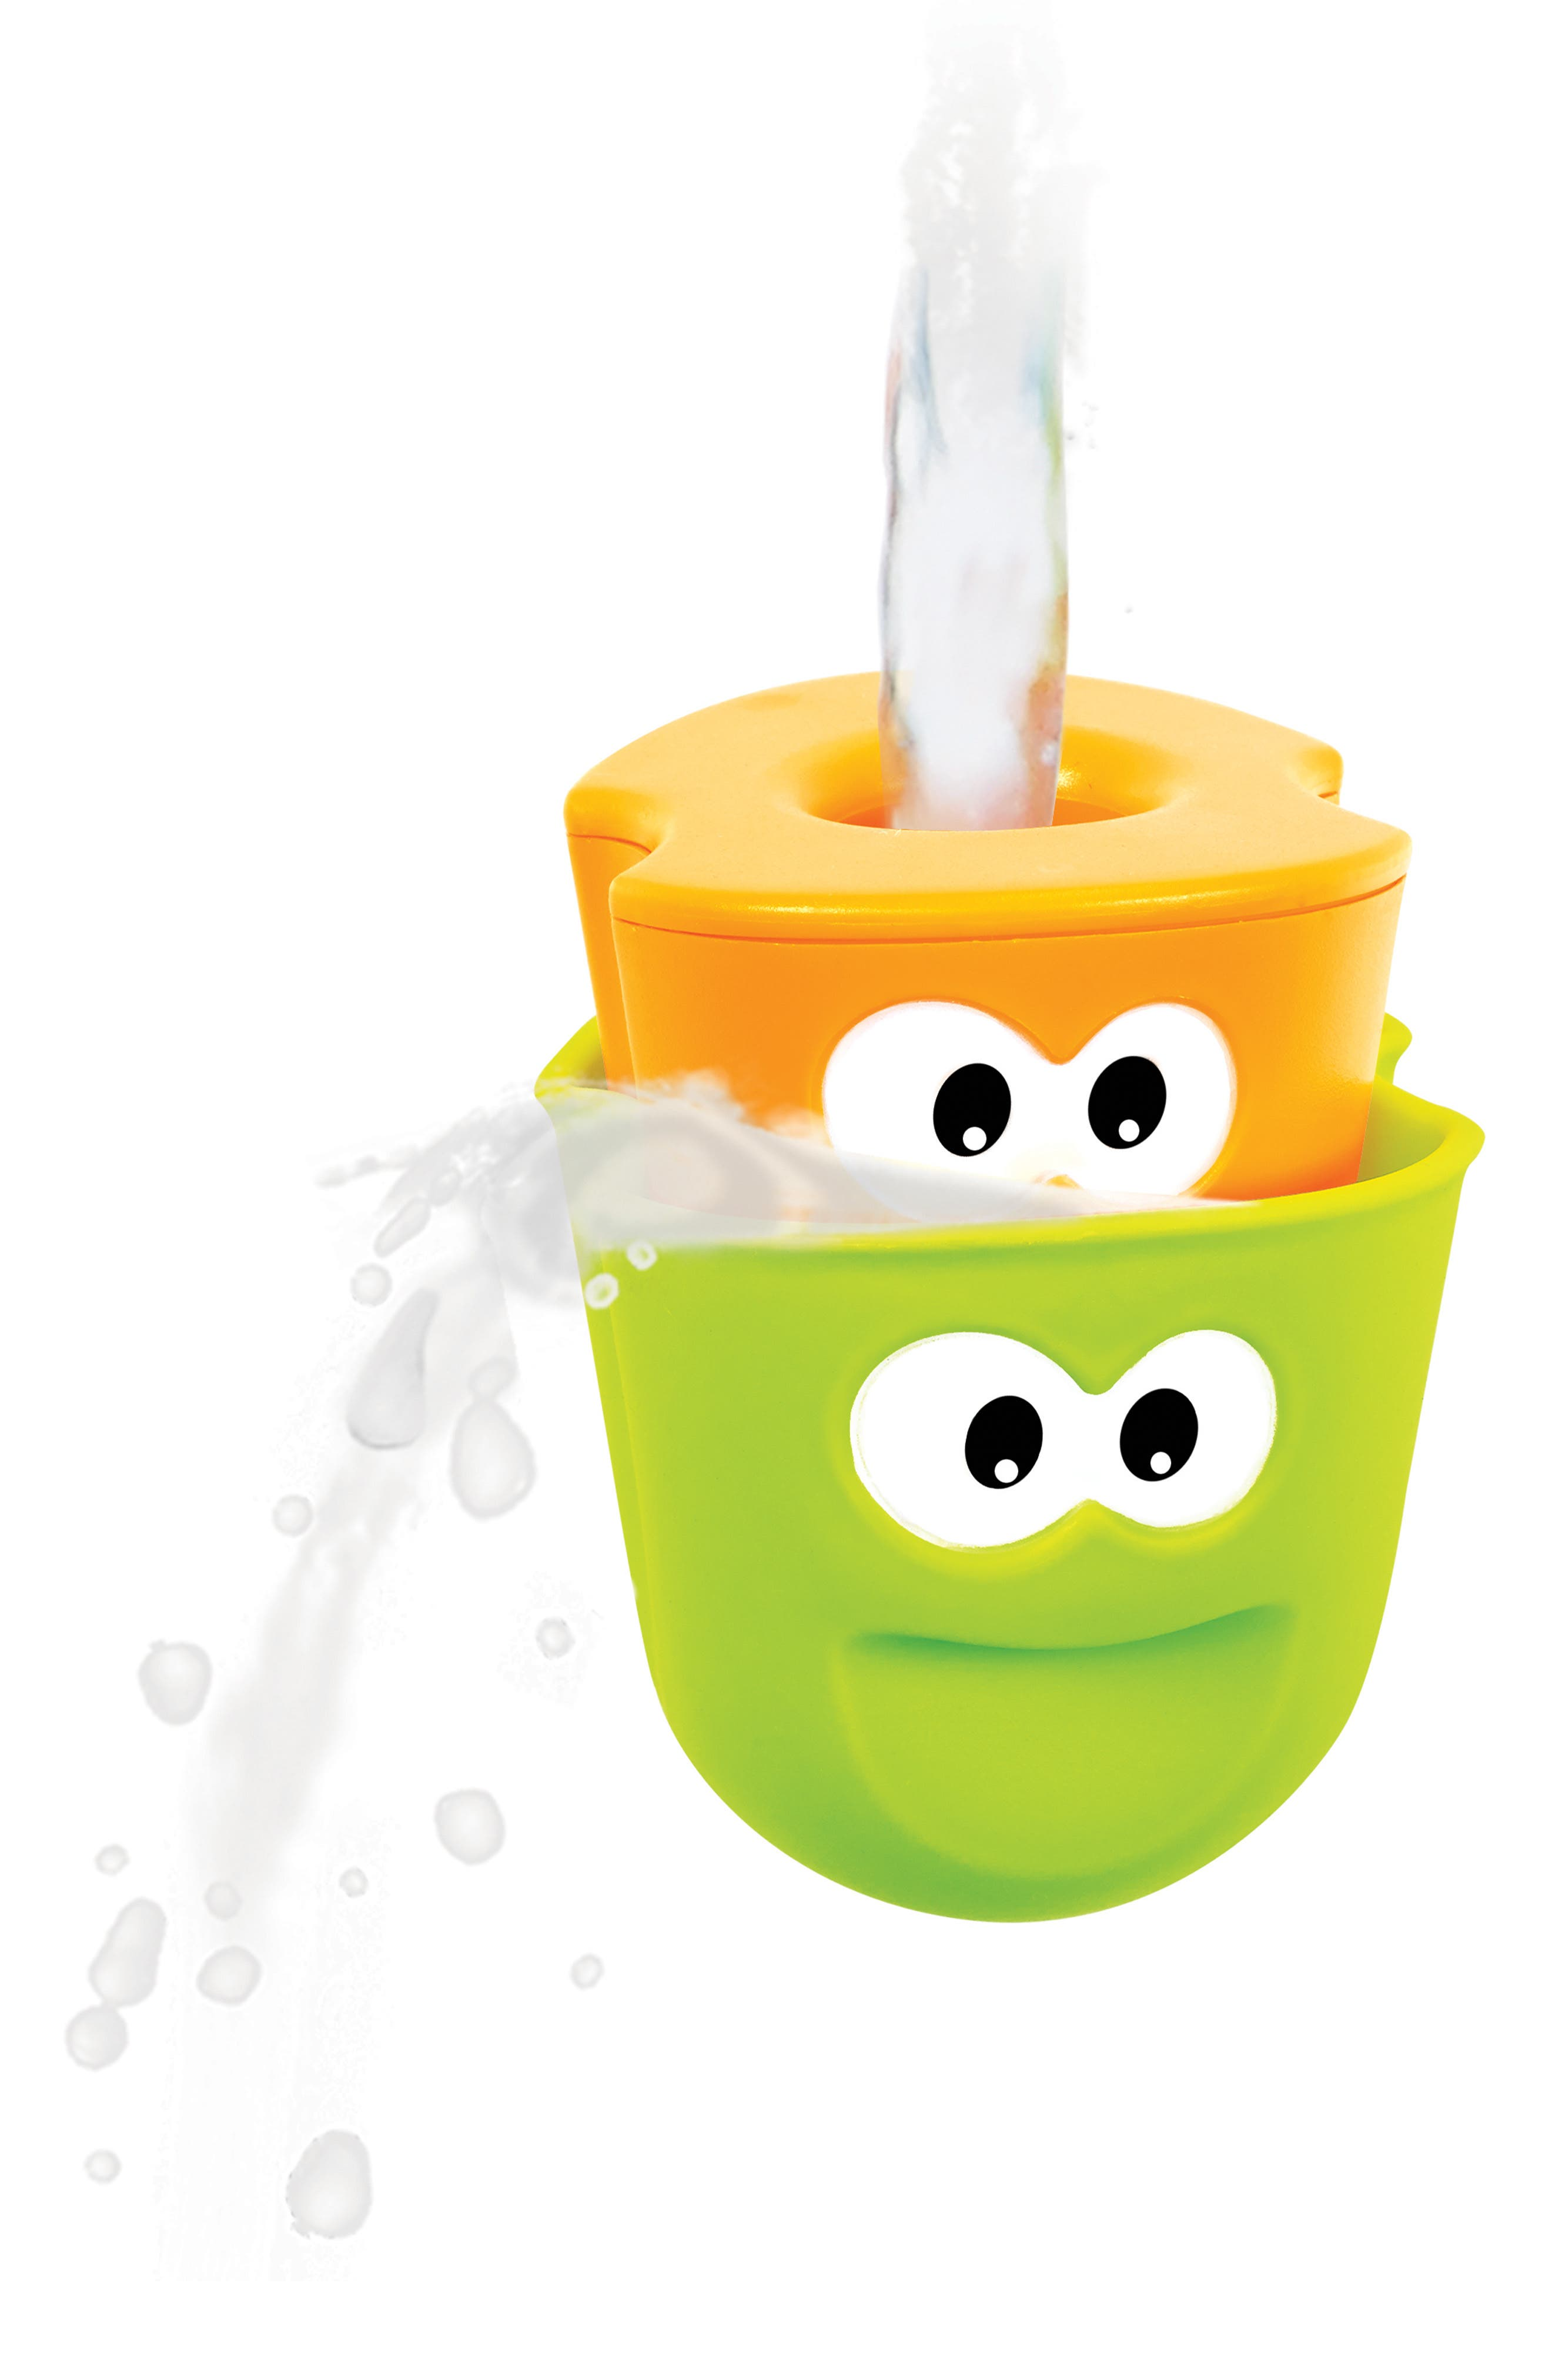 Flow 'N' Fill Spout Bath Toy,                             Alternate thumbnail 3, color,                             GREEN